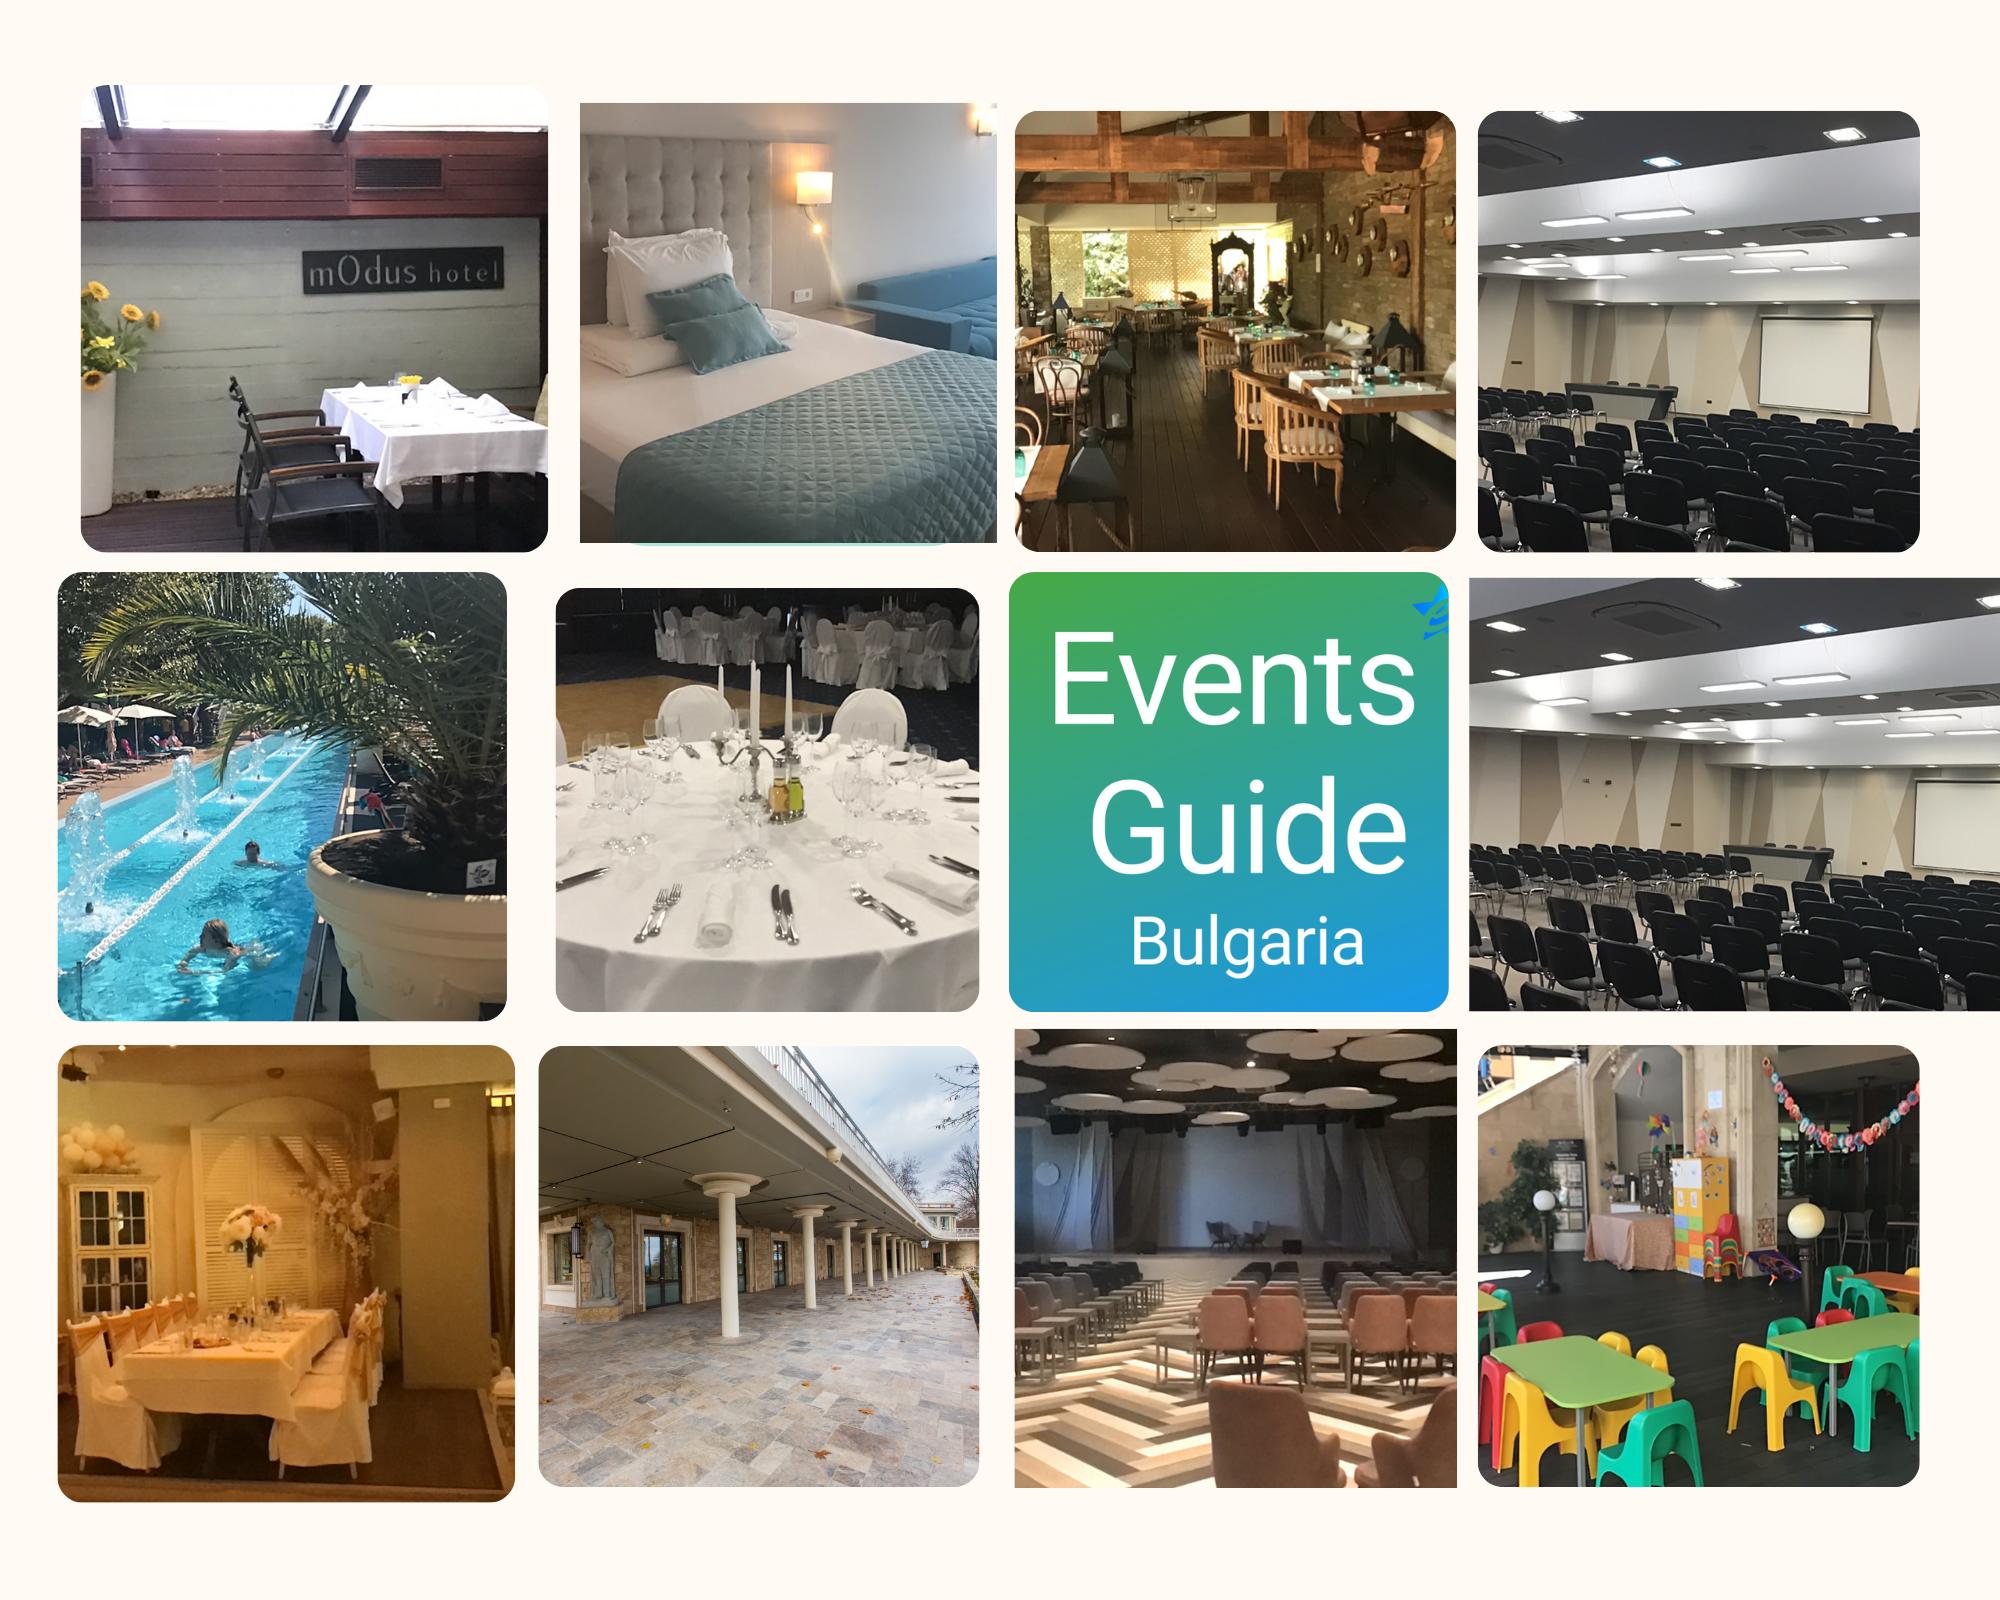 Events Guide Bulgaria